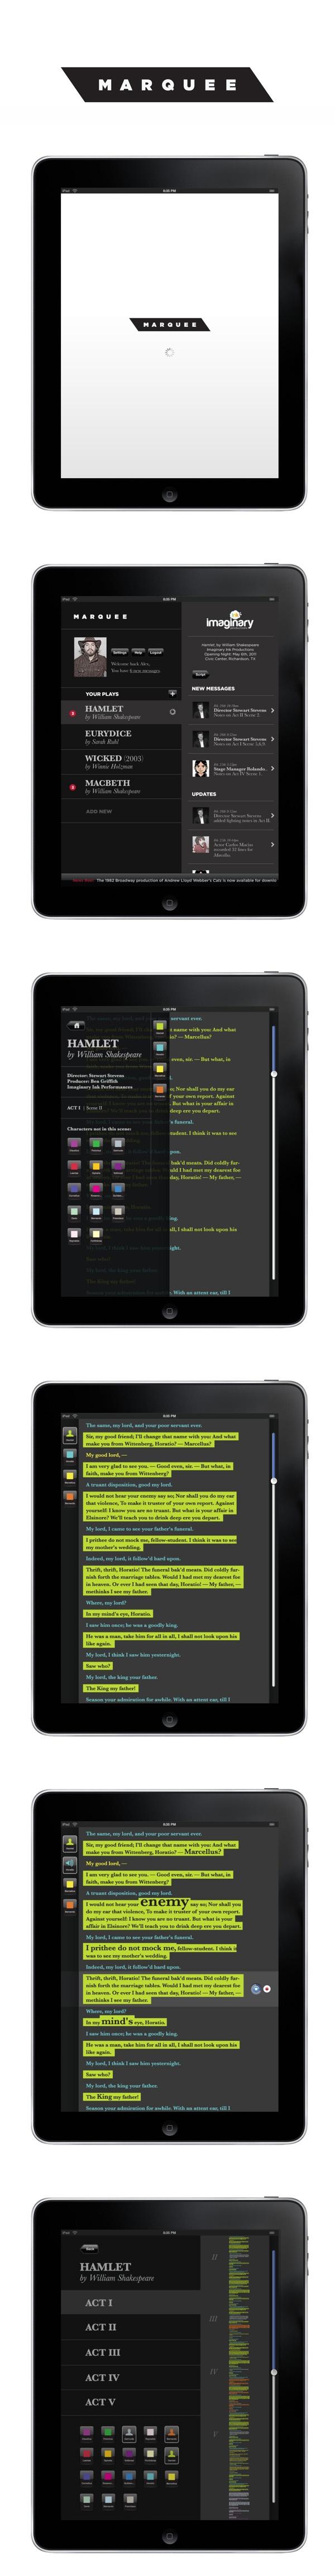 MARQUEE App | Designer: Rolando Alcantara